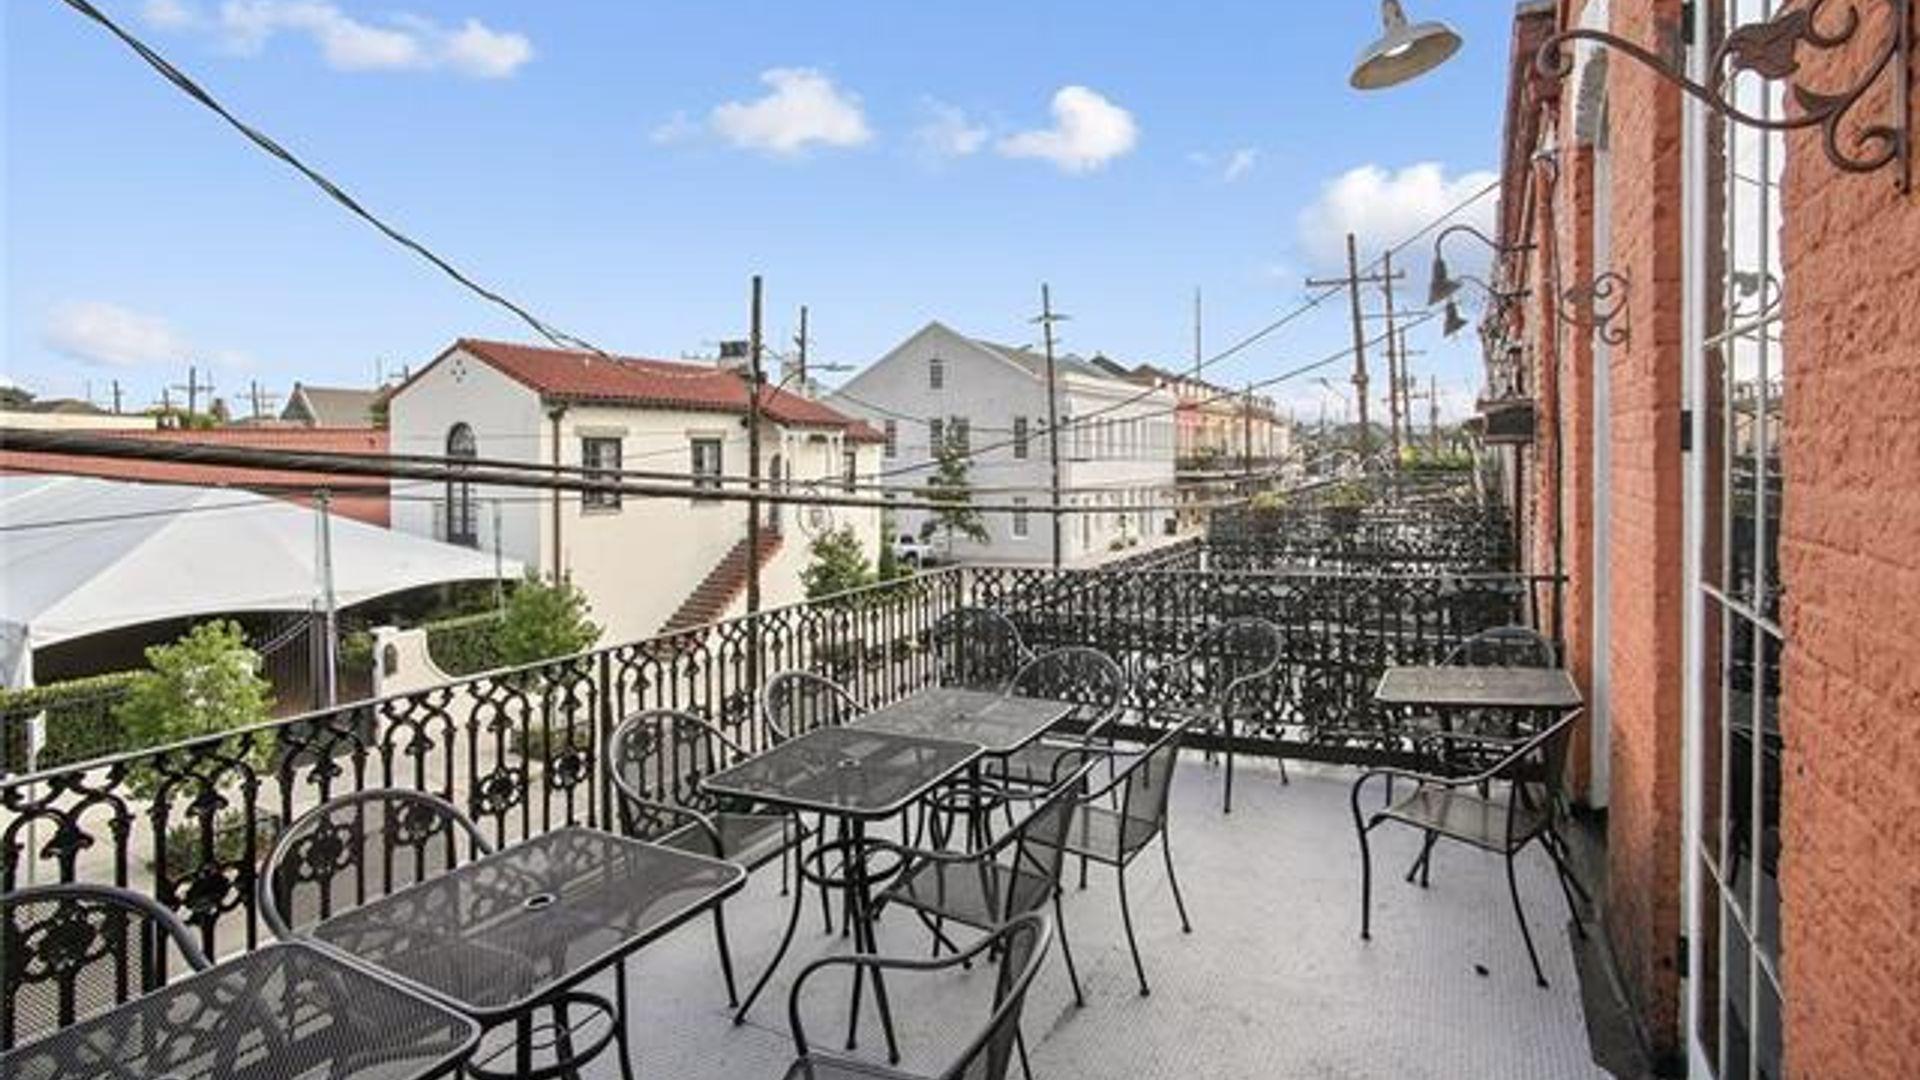 Apartment at 1910 Magazine Street, New Orleans, LA 70118 ...